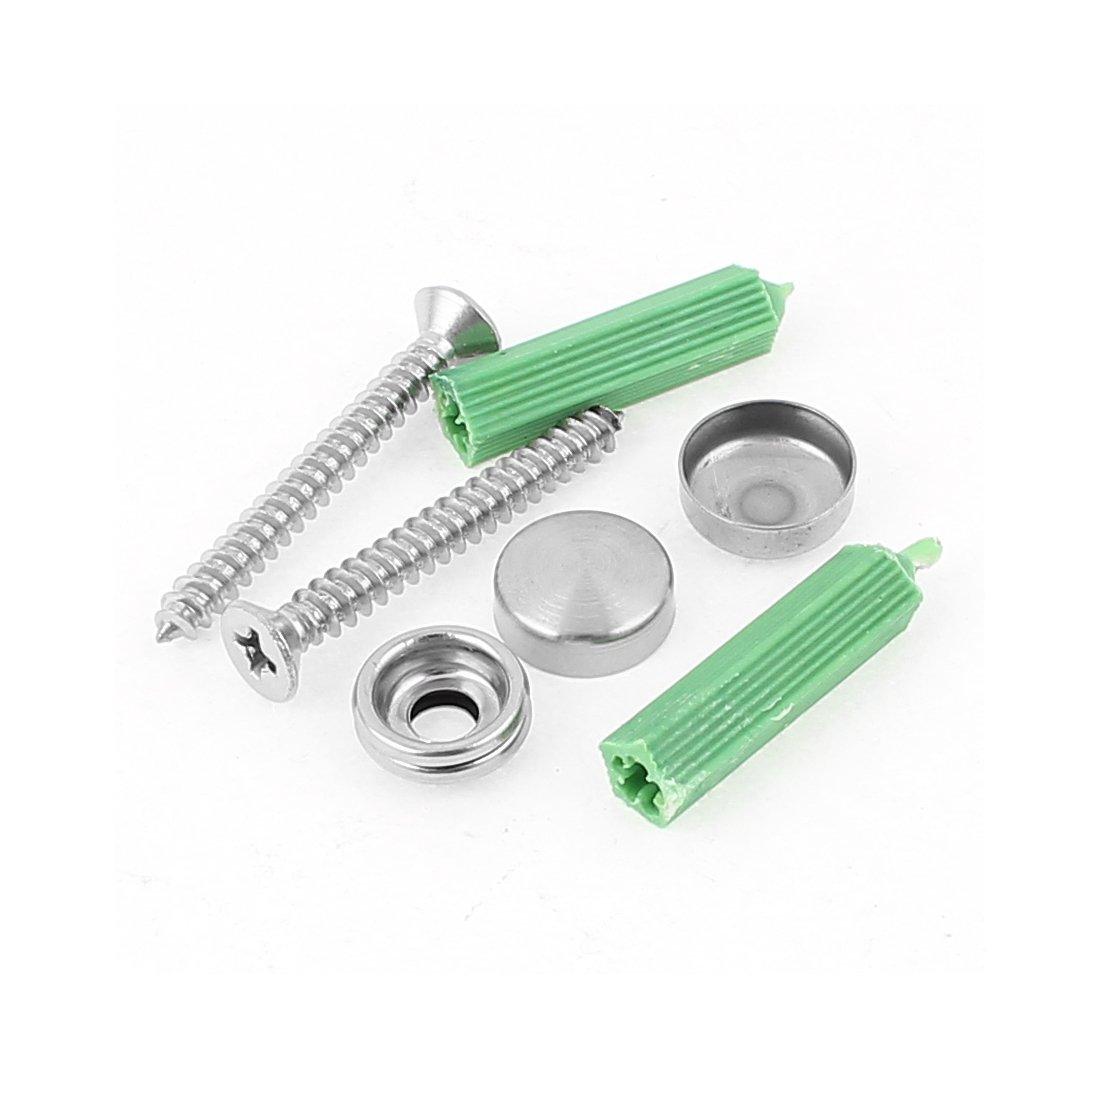 eDealMax Aluminum Wall Mounted Adjustable 5 Hooks Kitchenware Hanger Rack